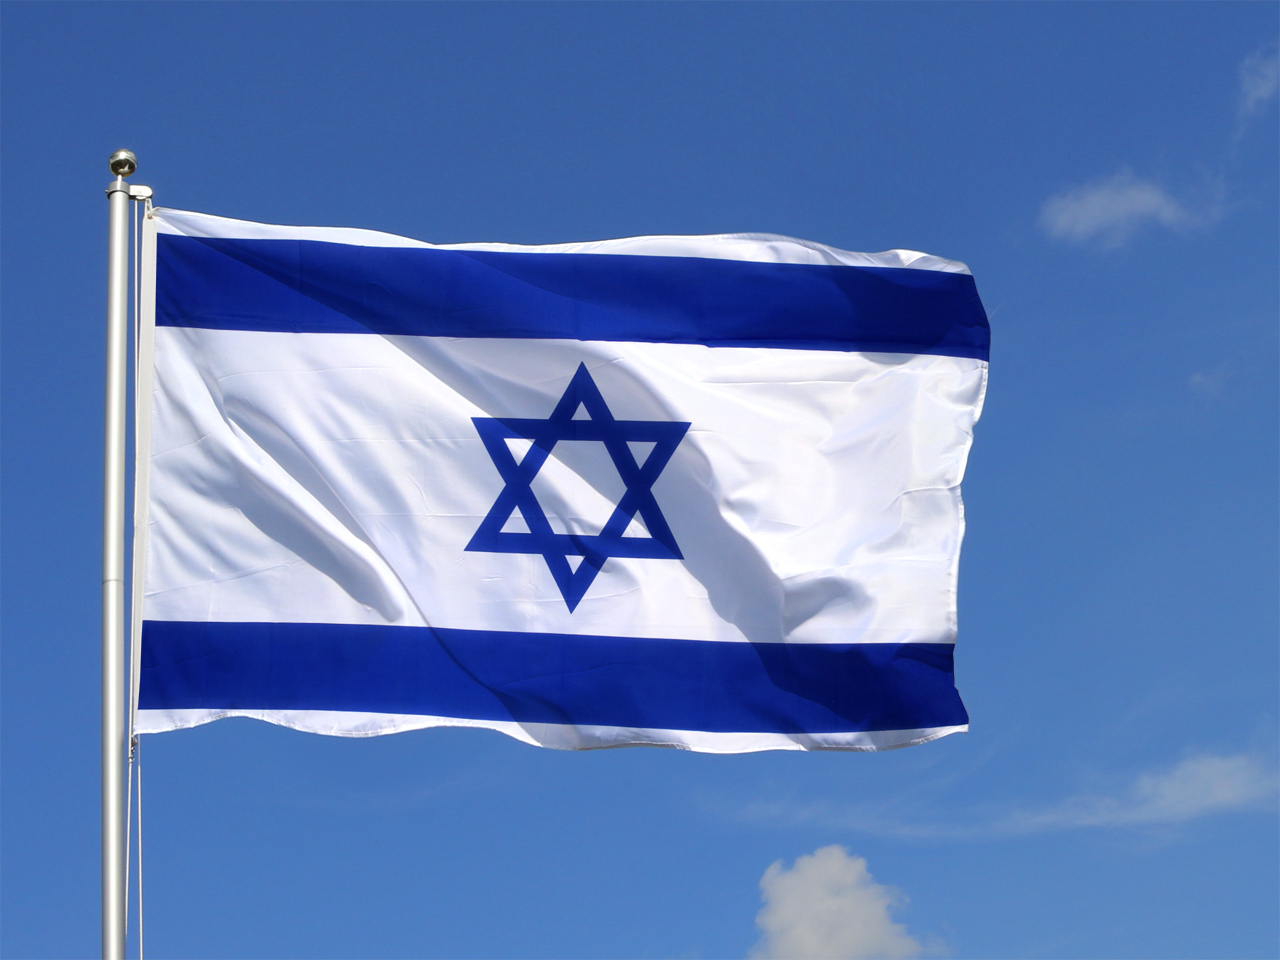 картинки с израильским флагом разработчикам доступно